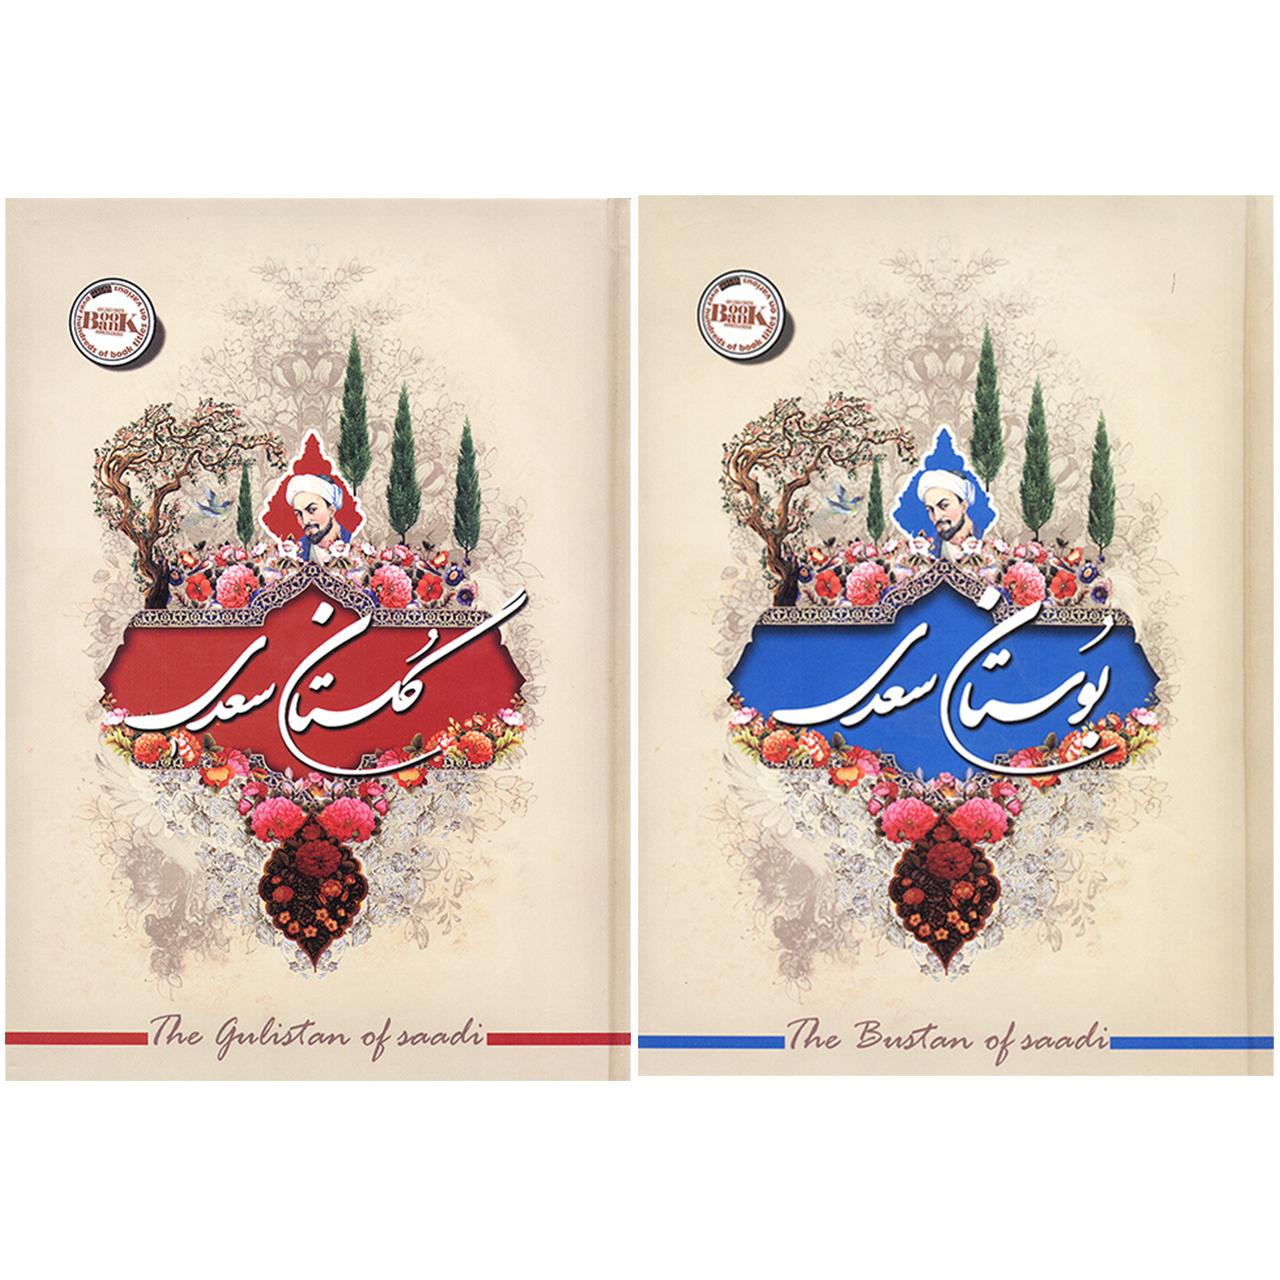 خرید                      کتاب بوستان و گلستان سعدی اثر مصلح بن عبدالله سعدی شیرازی نشر آفرینه